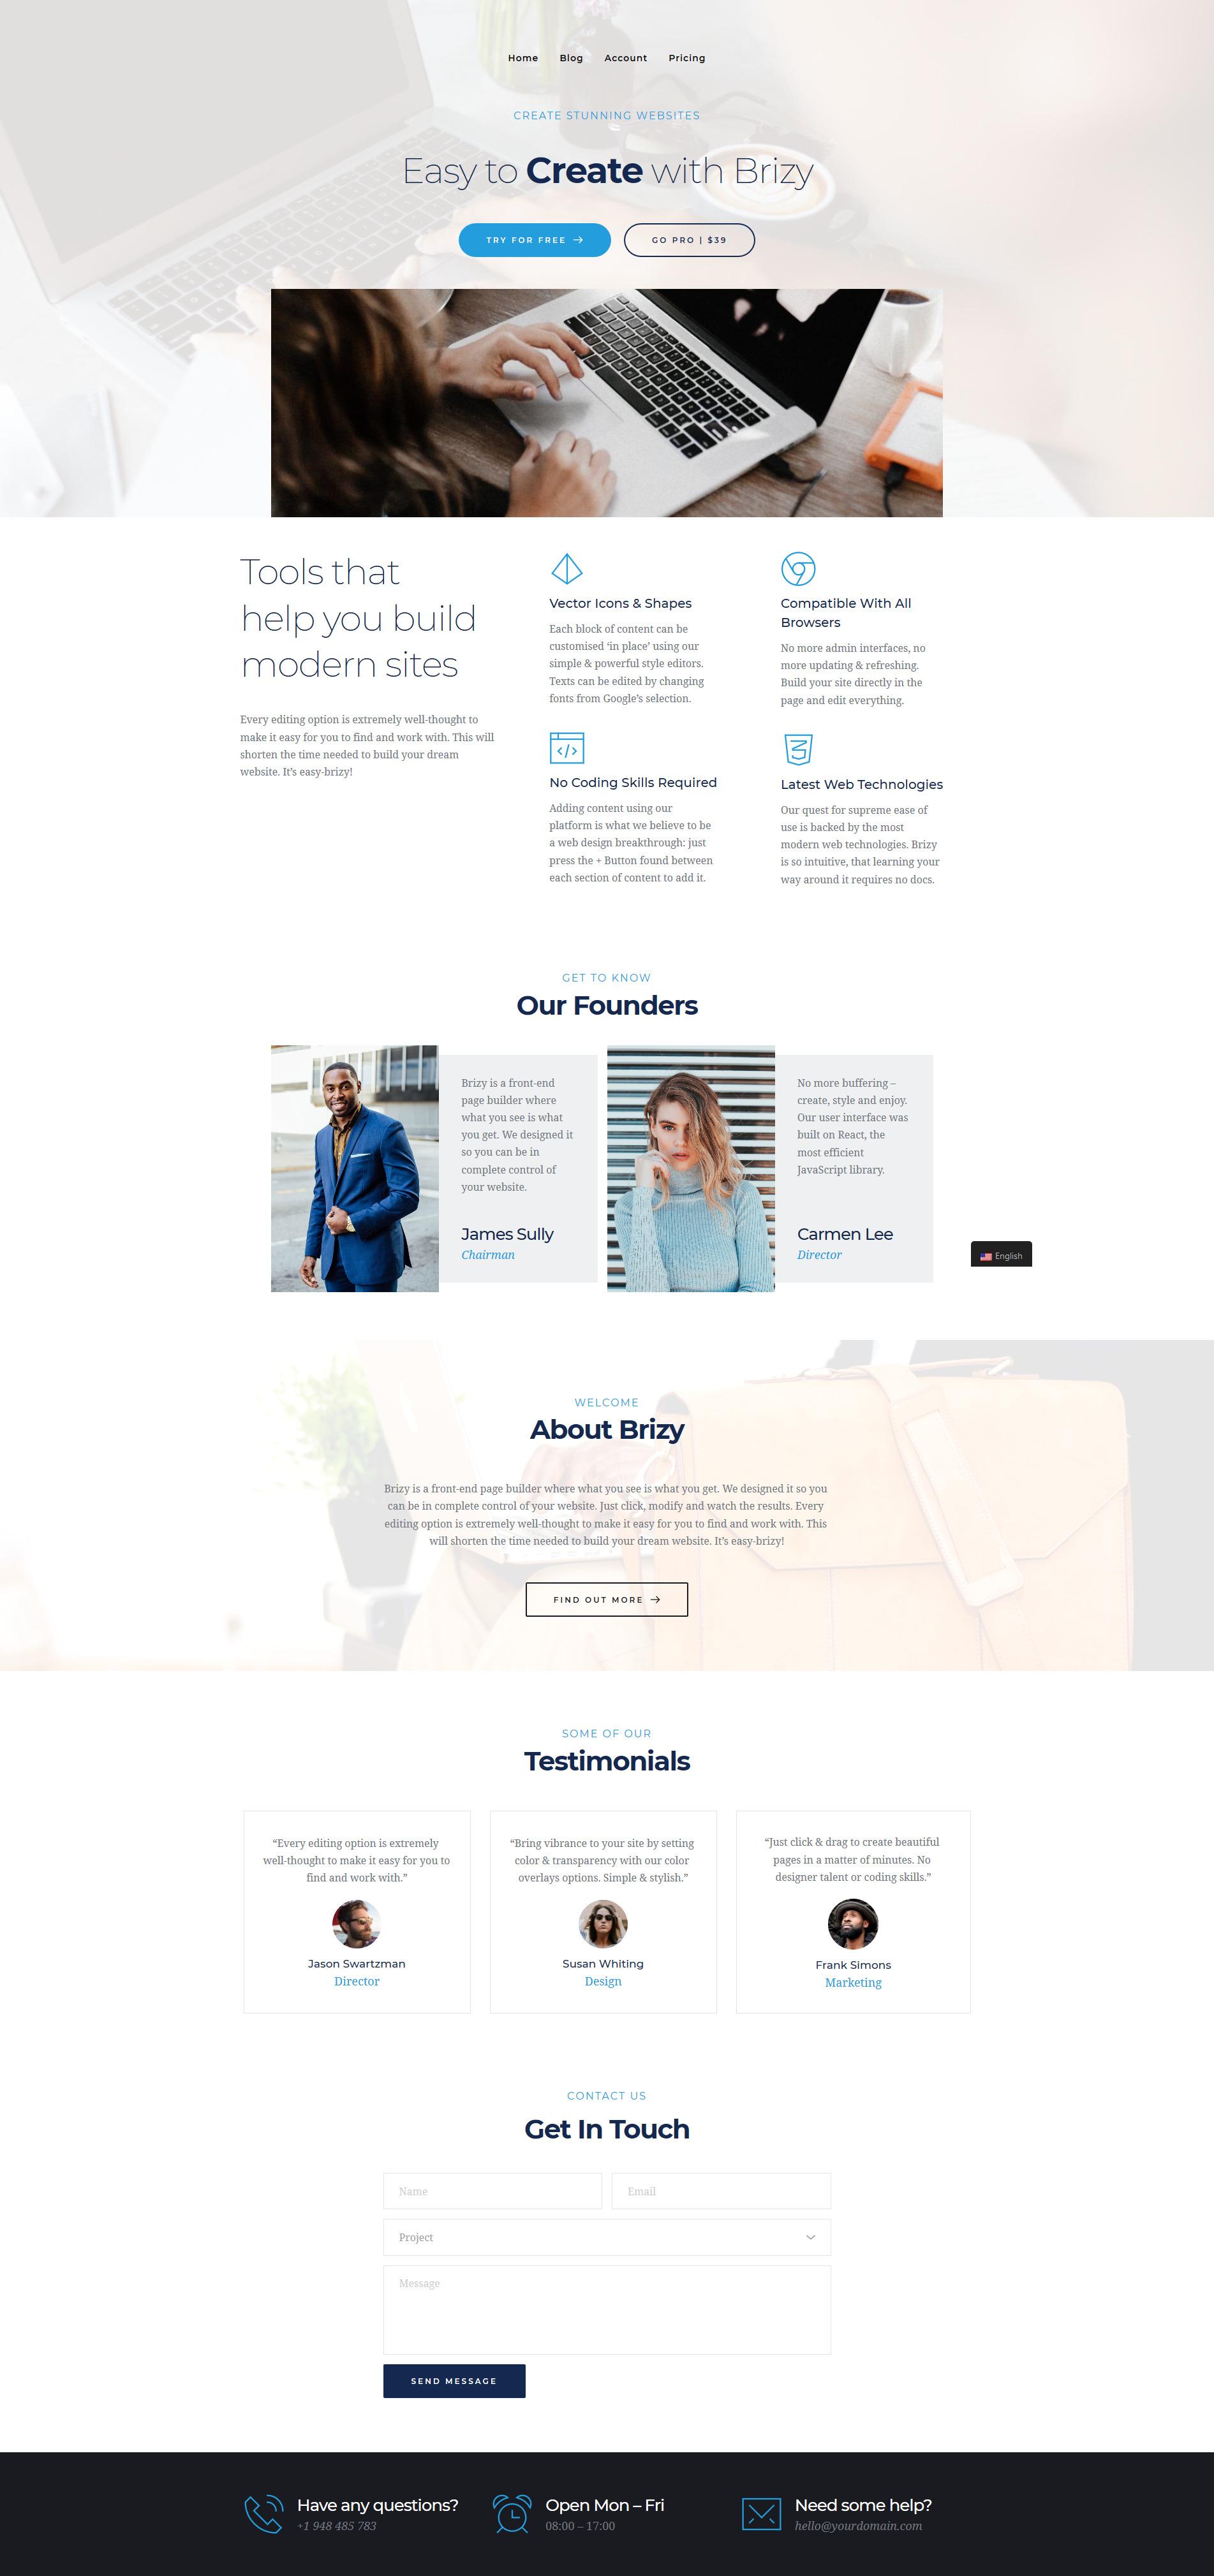 Translate Brizy Page Builder sites using TranslatePress